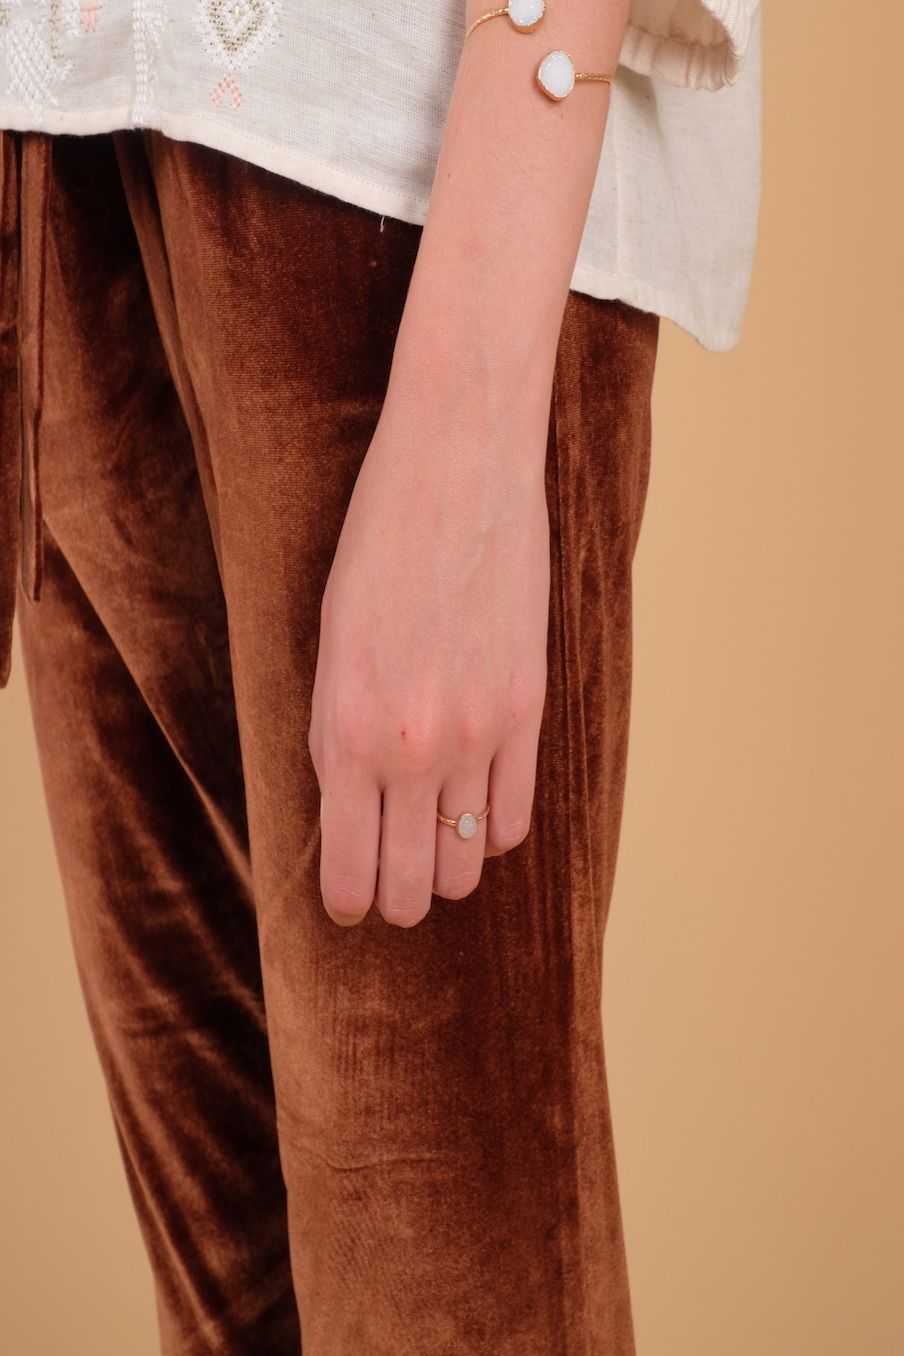 bohemian chic vintage ring woman sofia ice